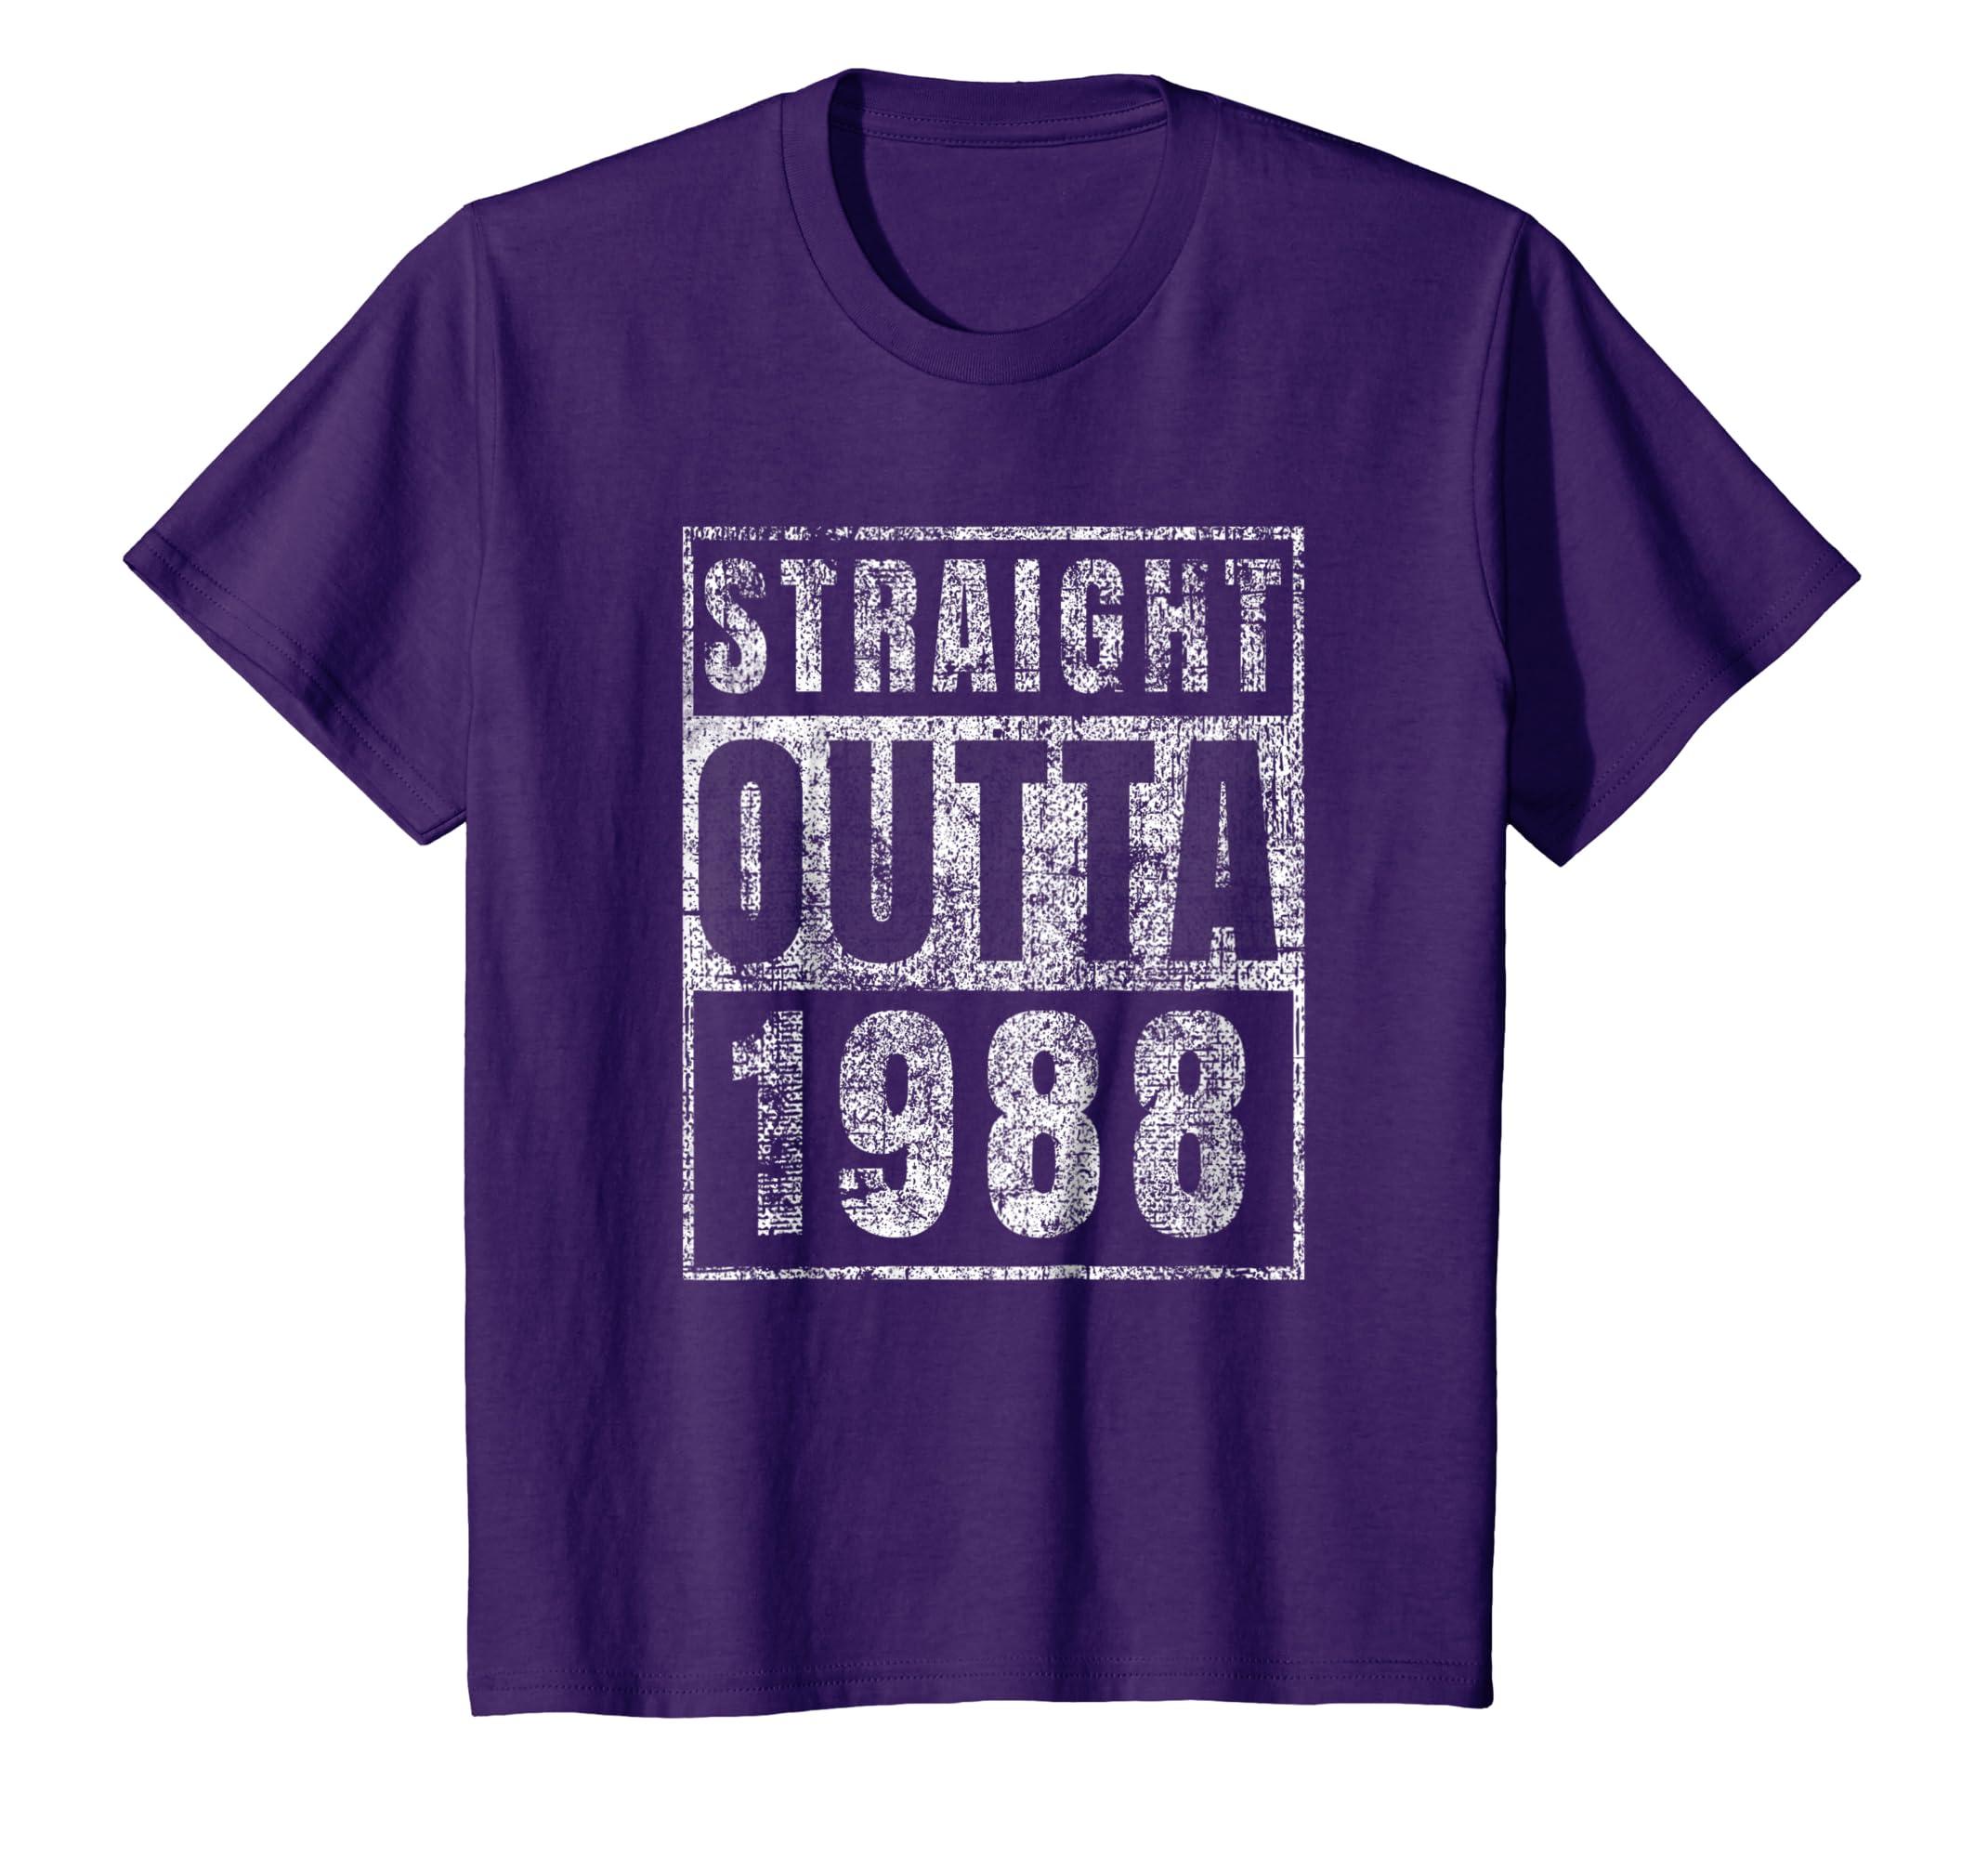 Amazon Straight Outta 1988 T Shirt 30th Birthday Gift Men Him Funny Clothing